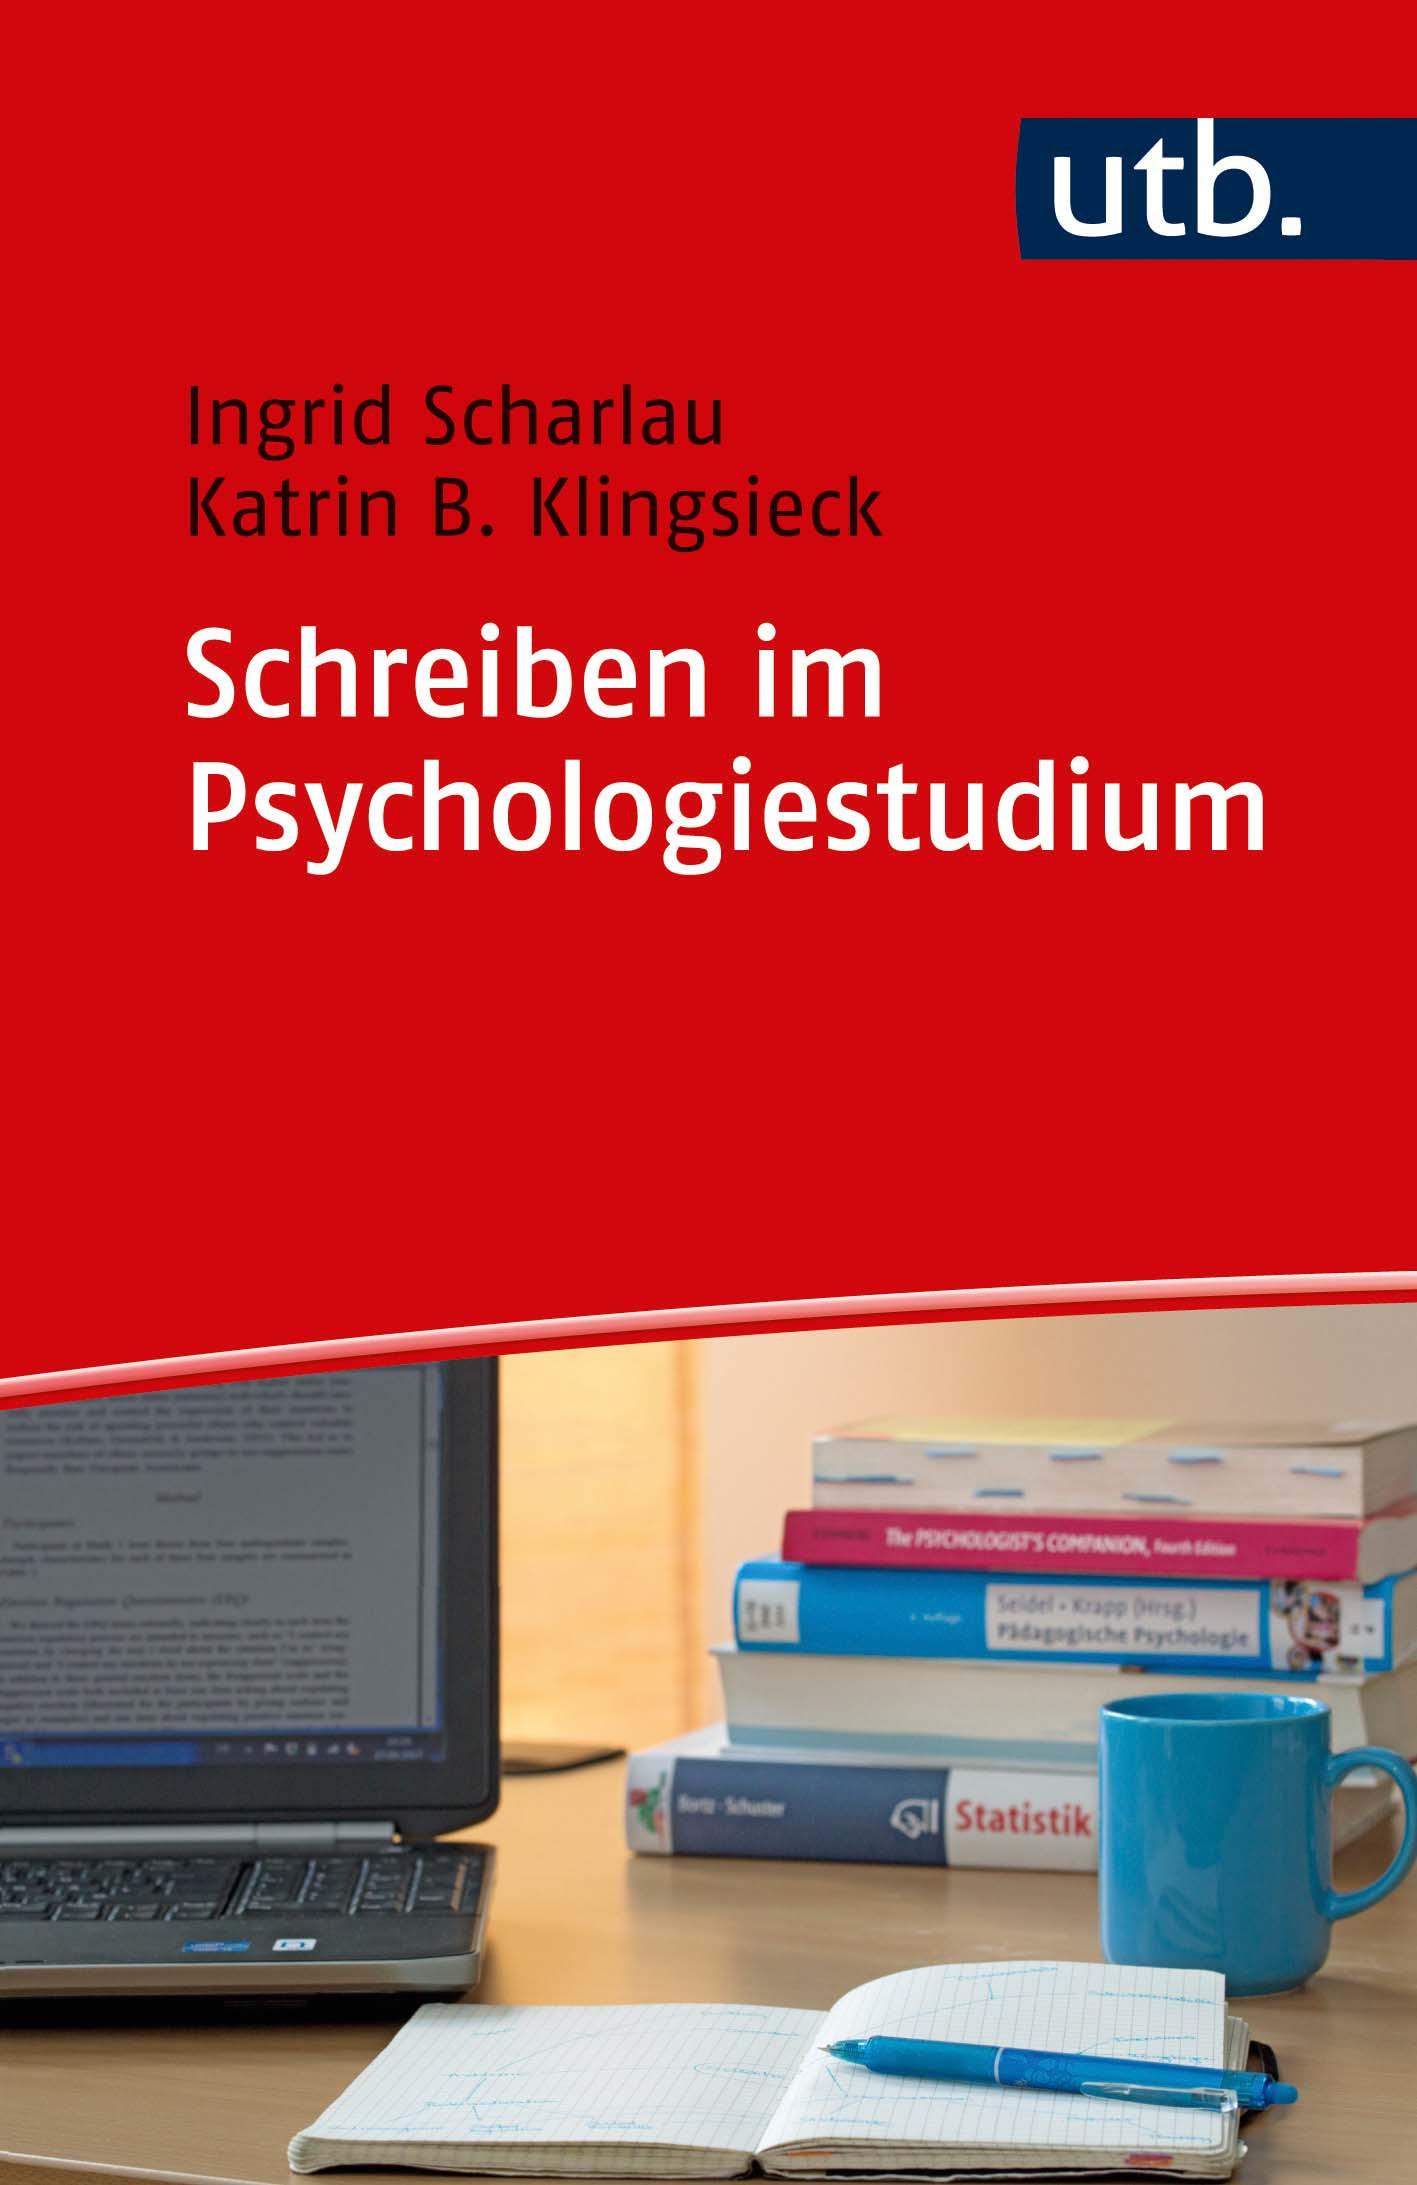 utb-ebook-schreiben-psychologiestudium